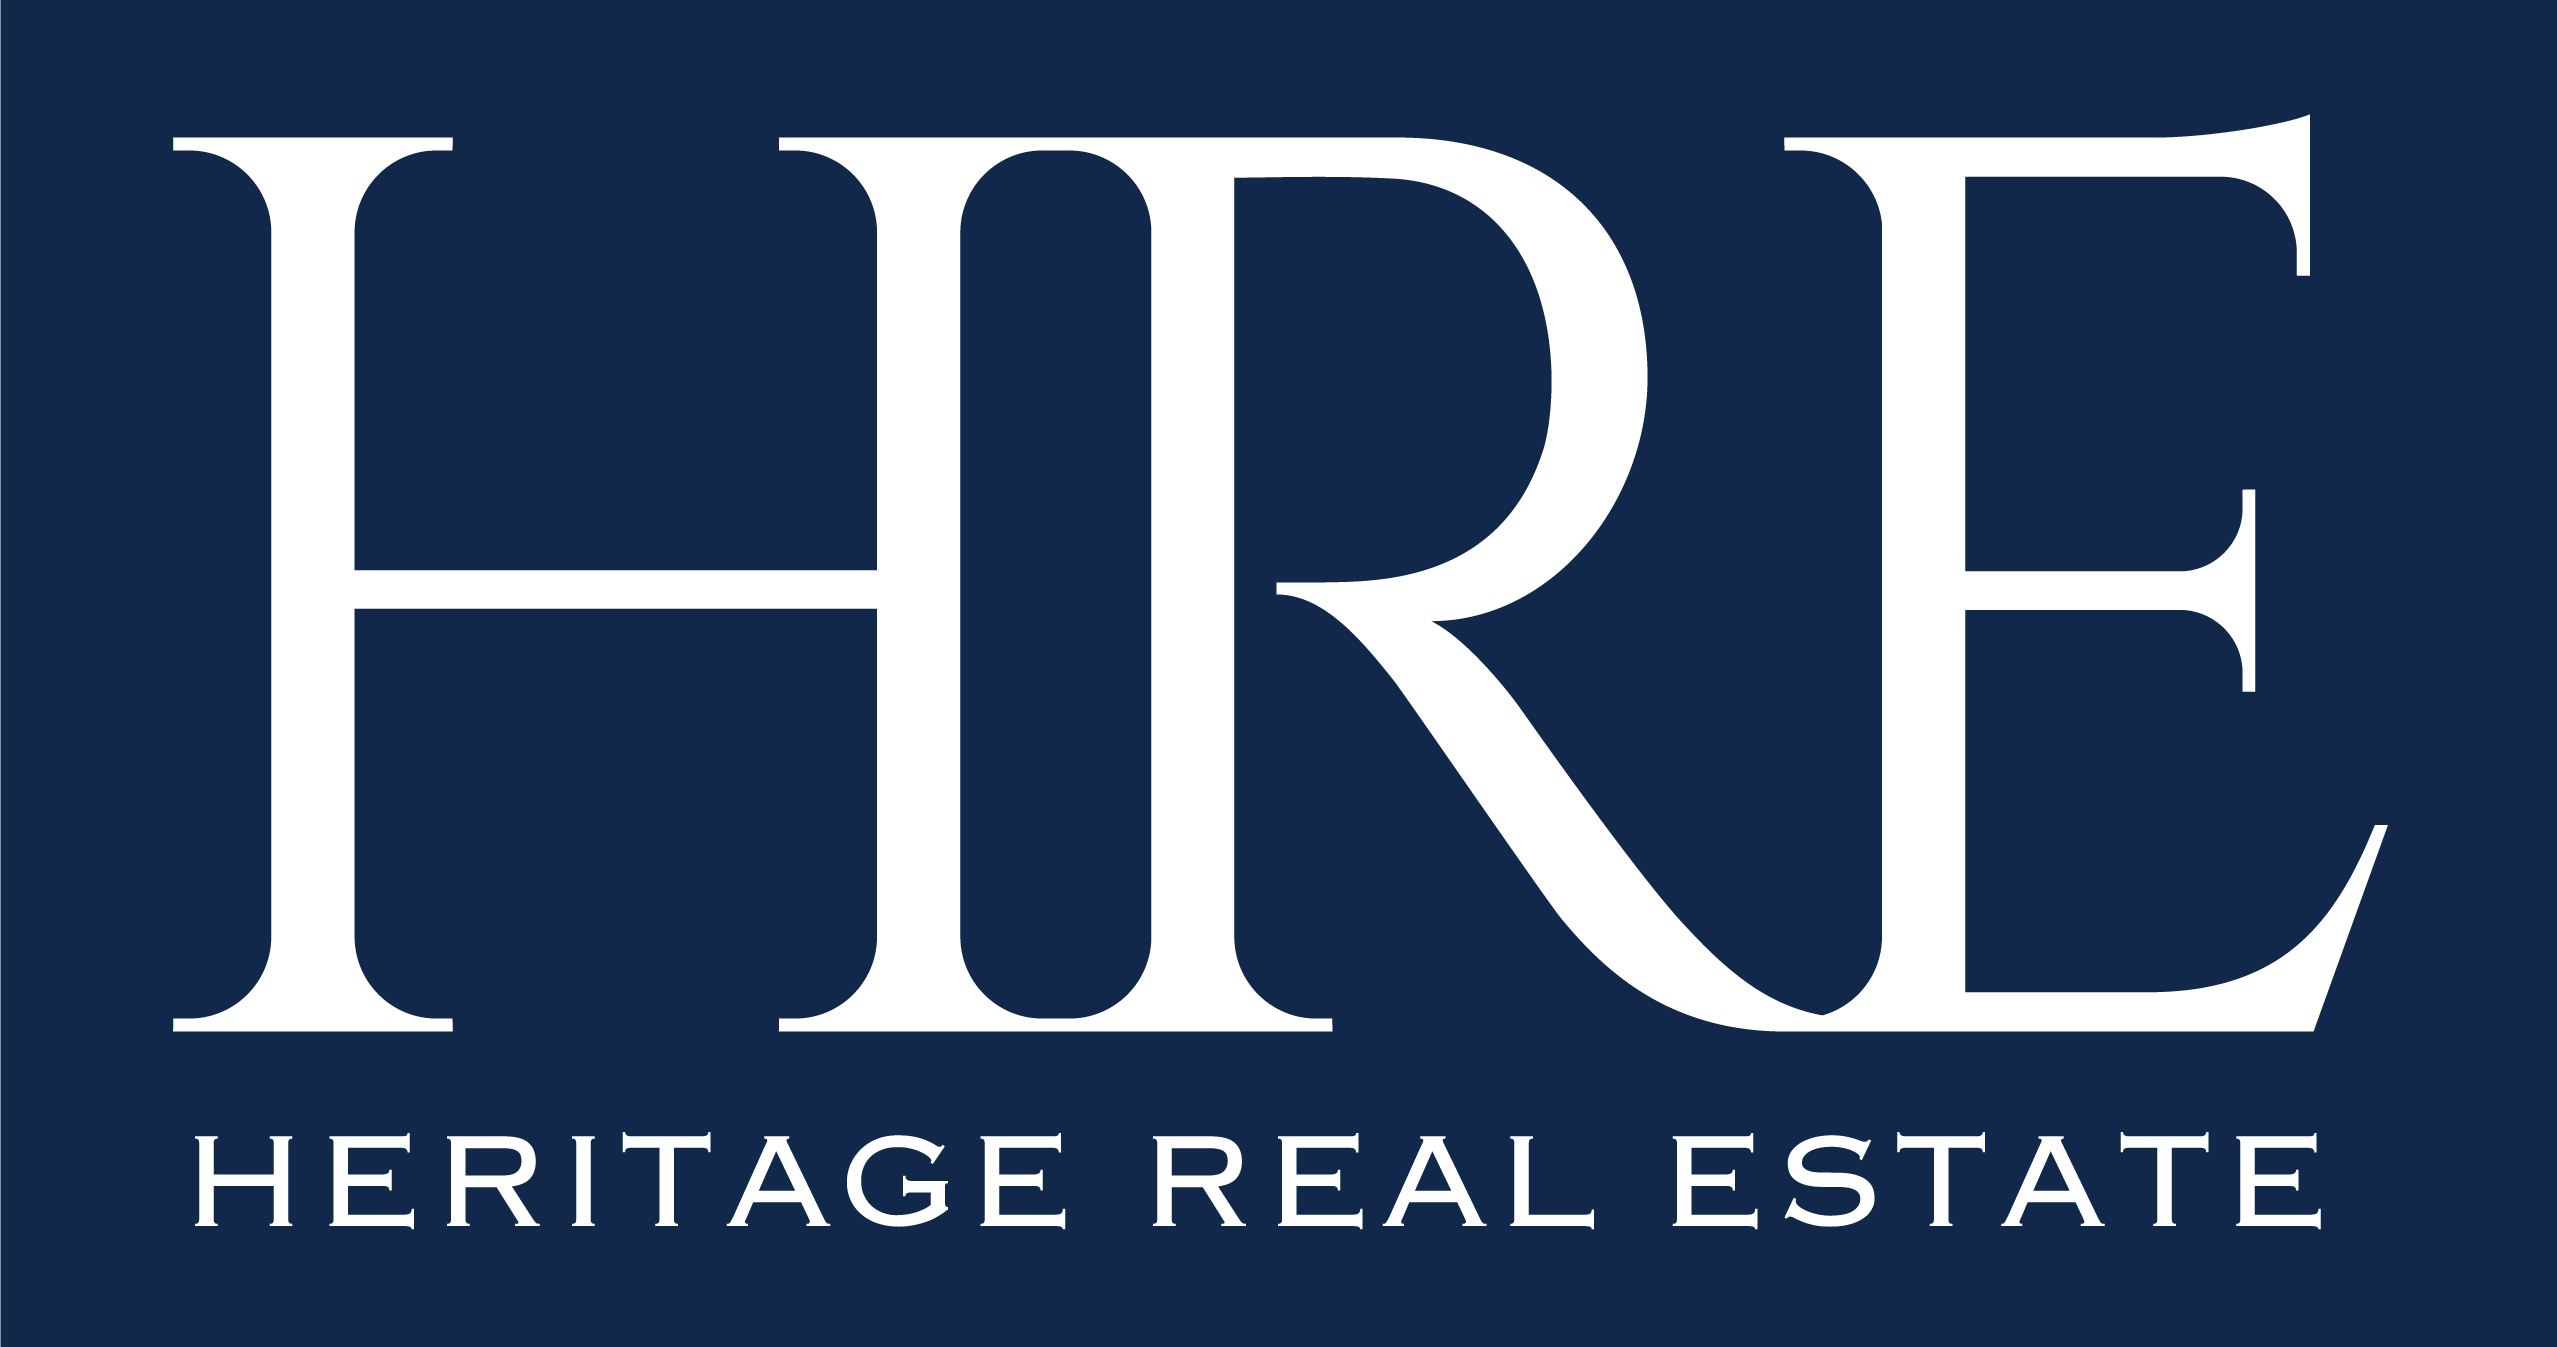 Heritage Real Estate, LLC